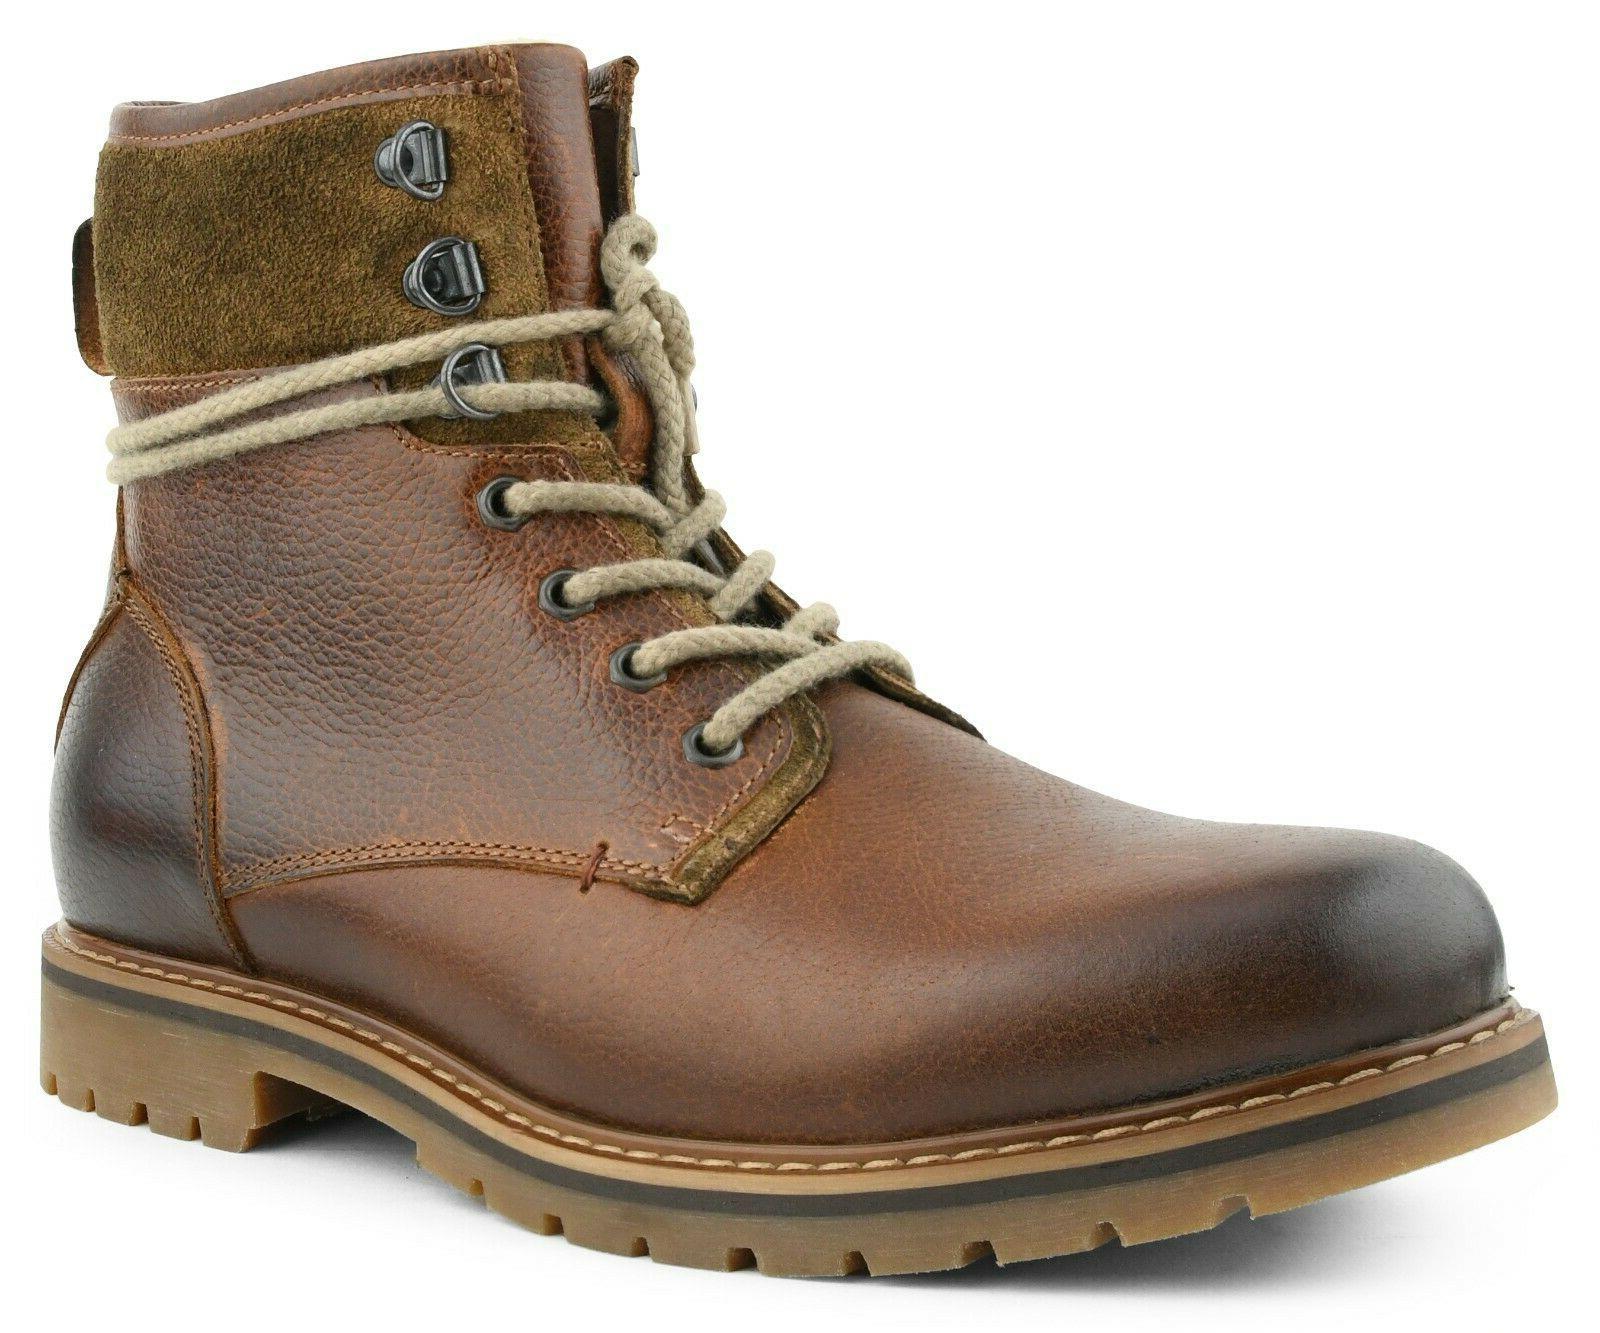 Genuine Lace-Up Boots Men, Work Boots, Combat